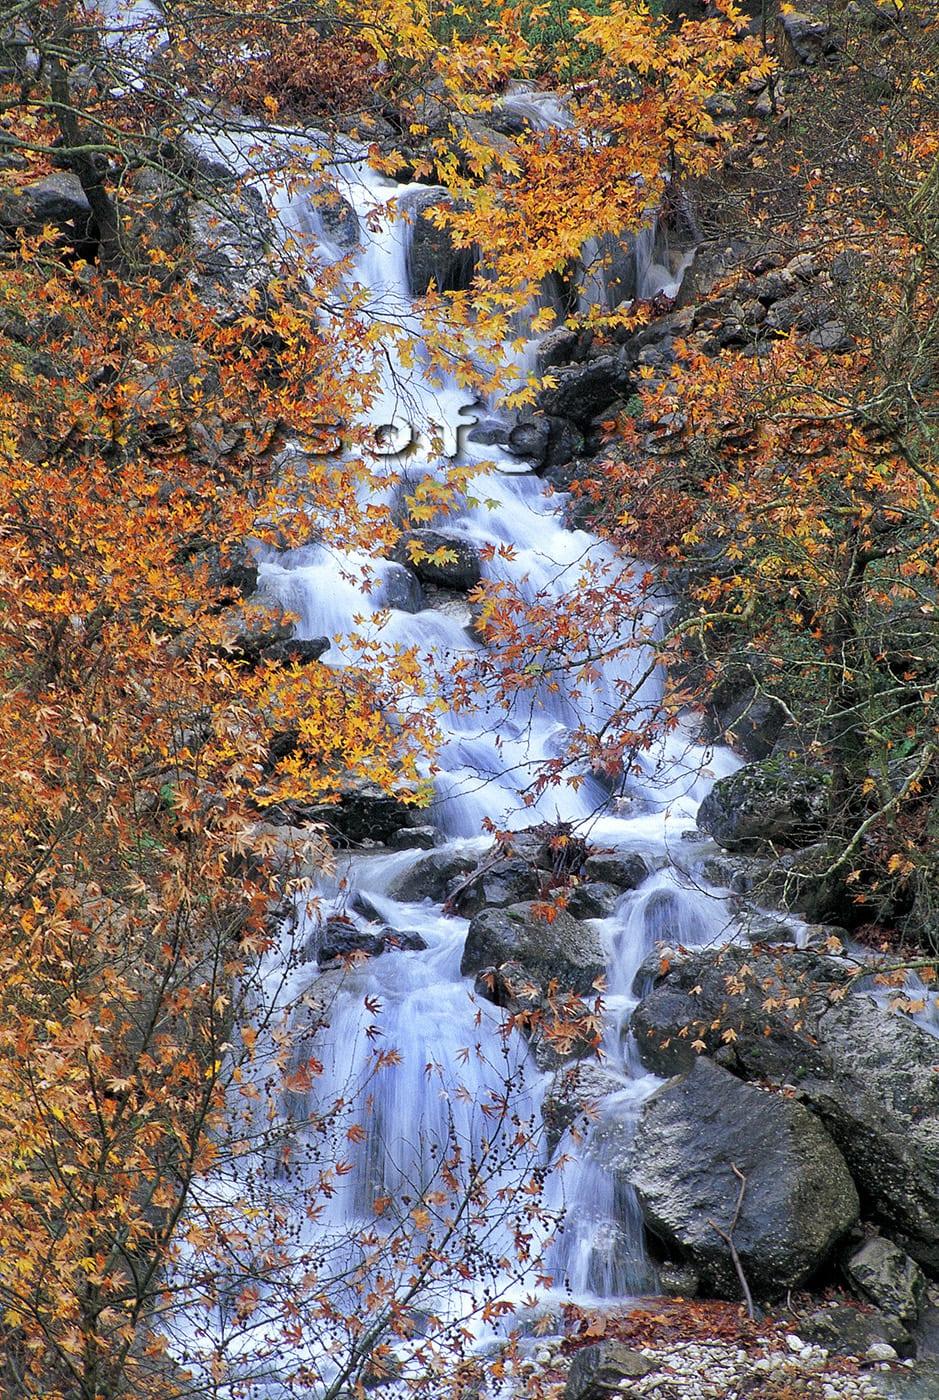 greece, greek, nature, outdoors, river, trikala, thessaly, mountain, tree, traditional, aspropotamos, bridge, landscape, ποταμός Αχελώος, Ασπροπόταμος, Χαλίκι, Φθινόπωρο, Νότια Πίνδος, νομός Τρικάλων, πέτρινα γεφύρια, διαδρομές 4χ4